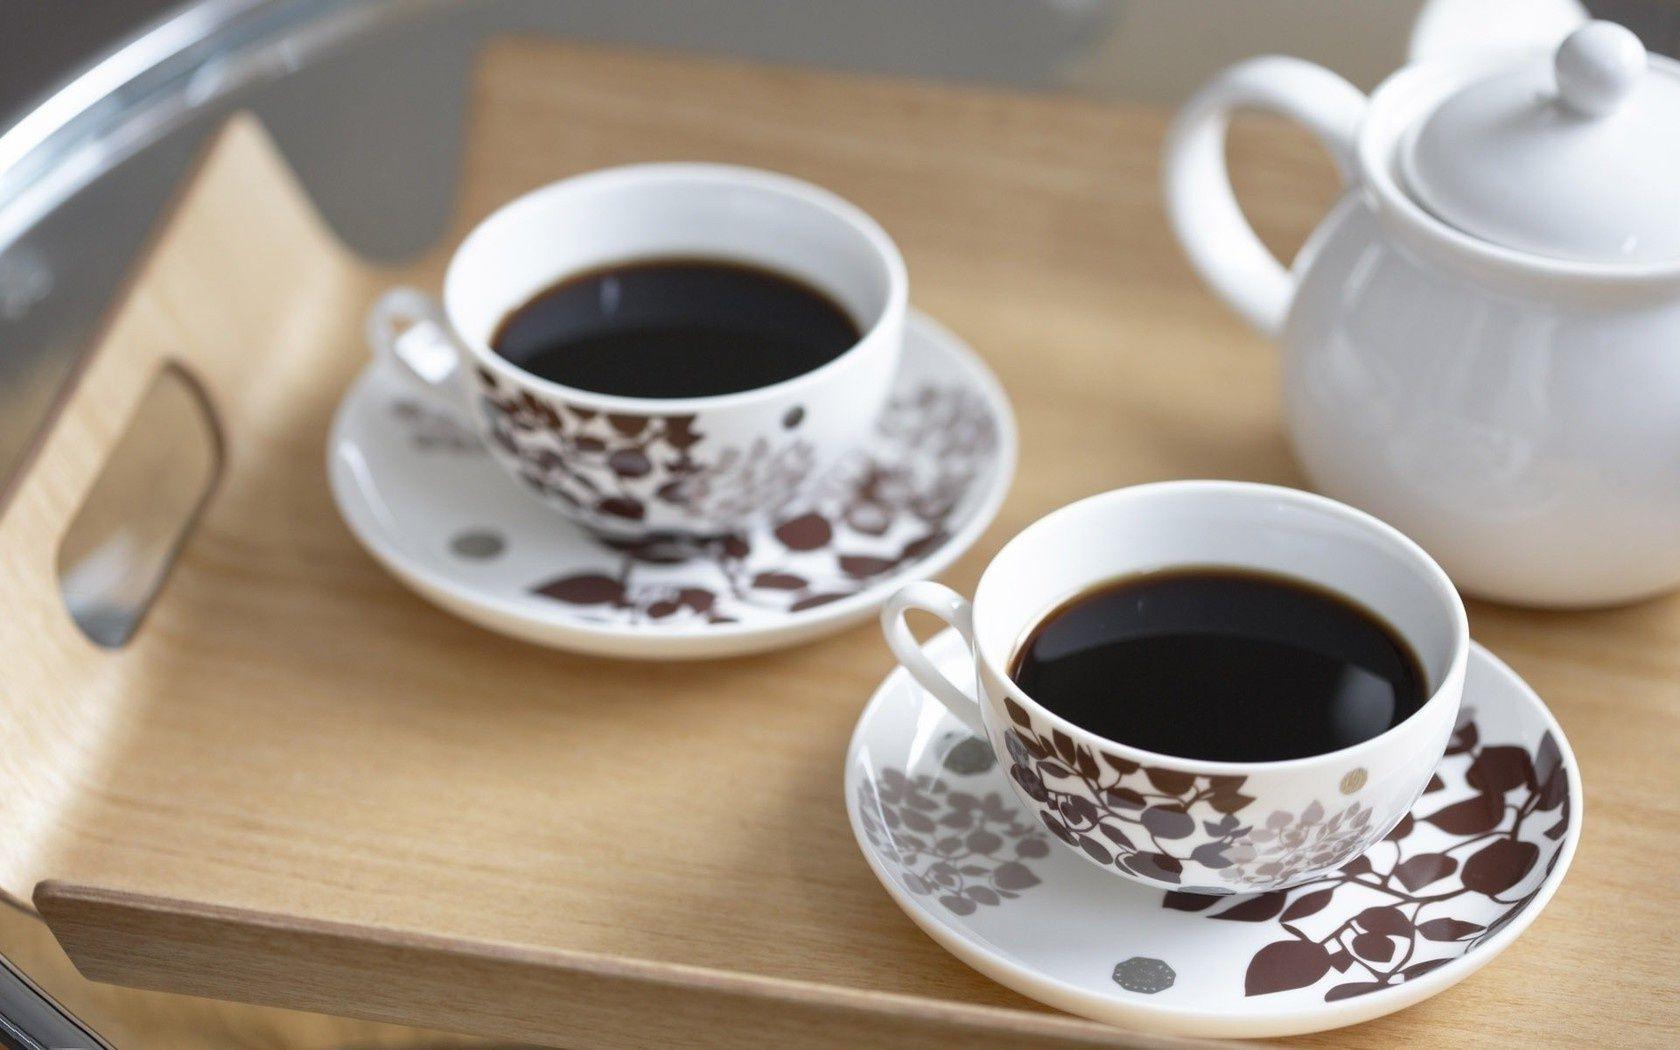 Открытка две чашки чая